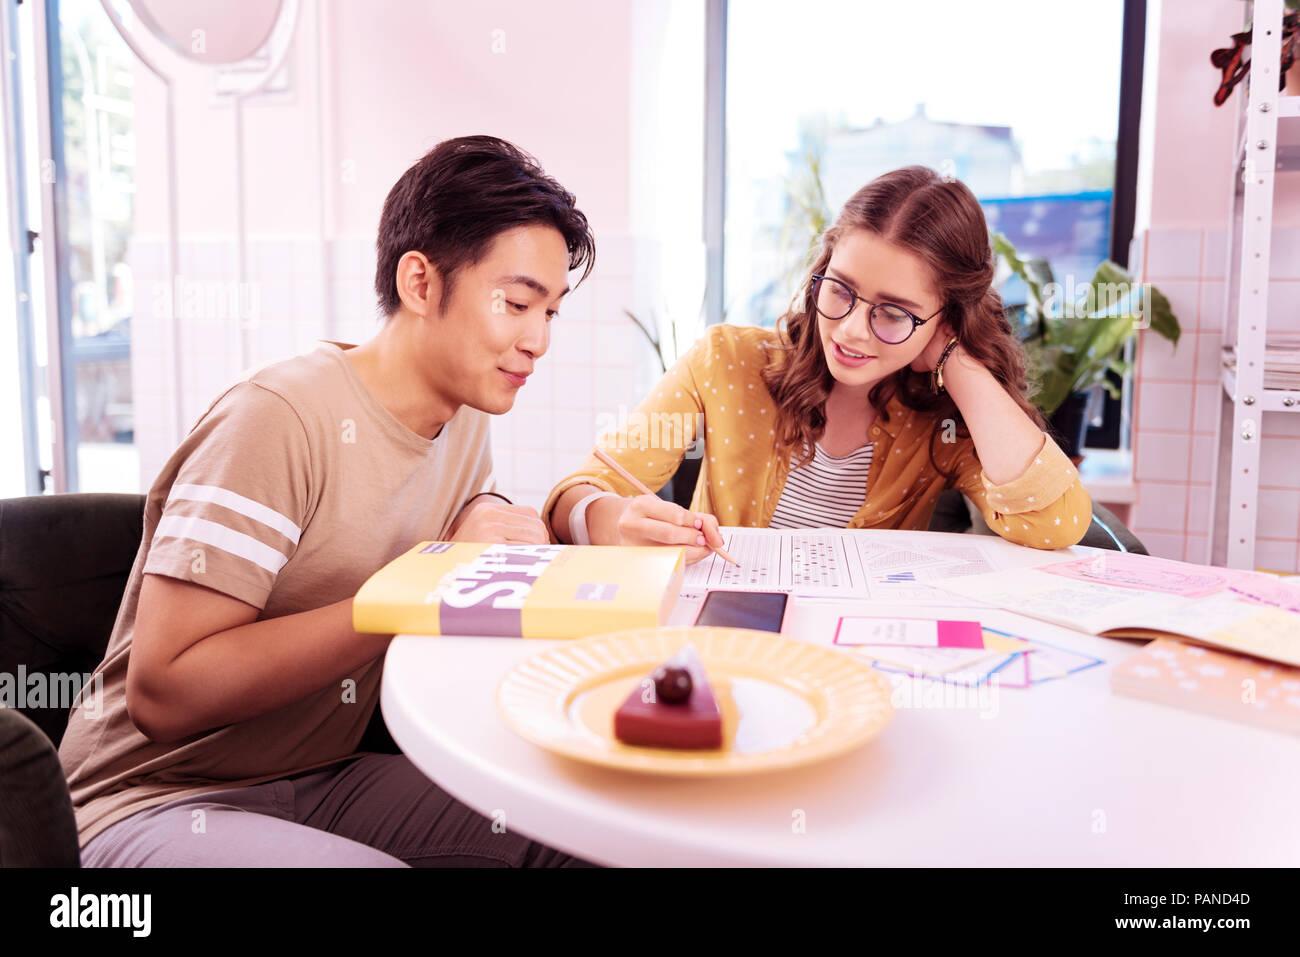 Two modern undergraduates eating cheesecake and studying - Stock Image